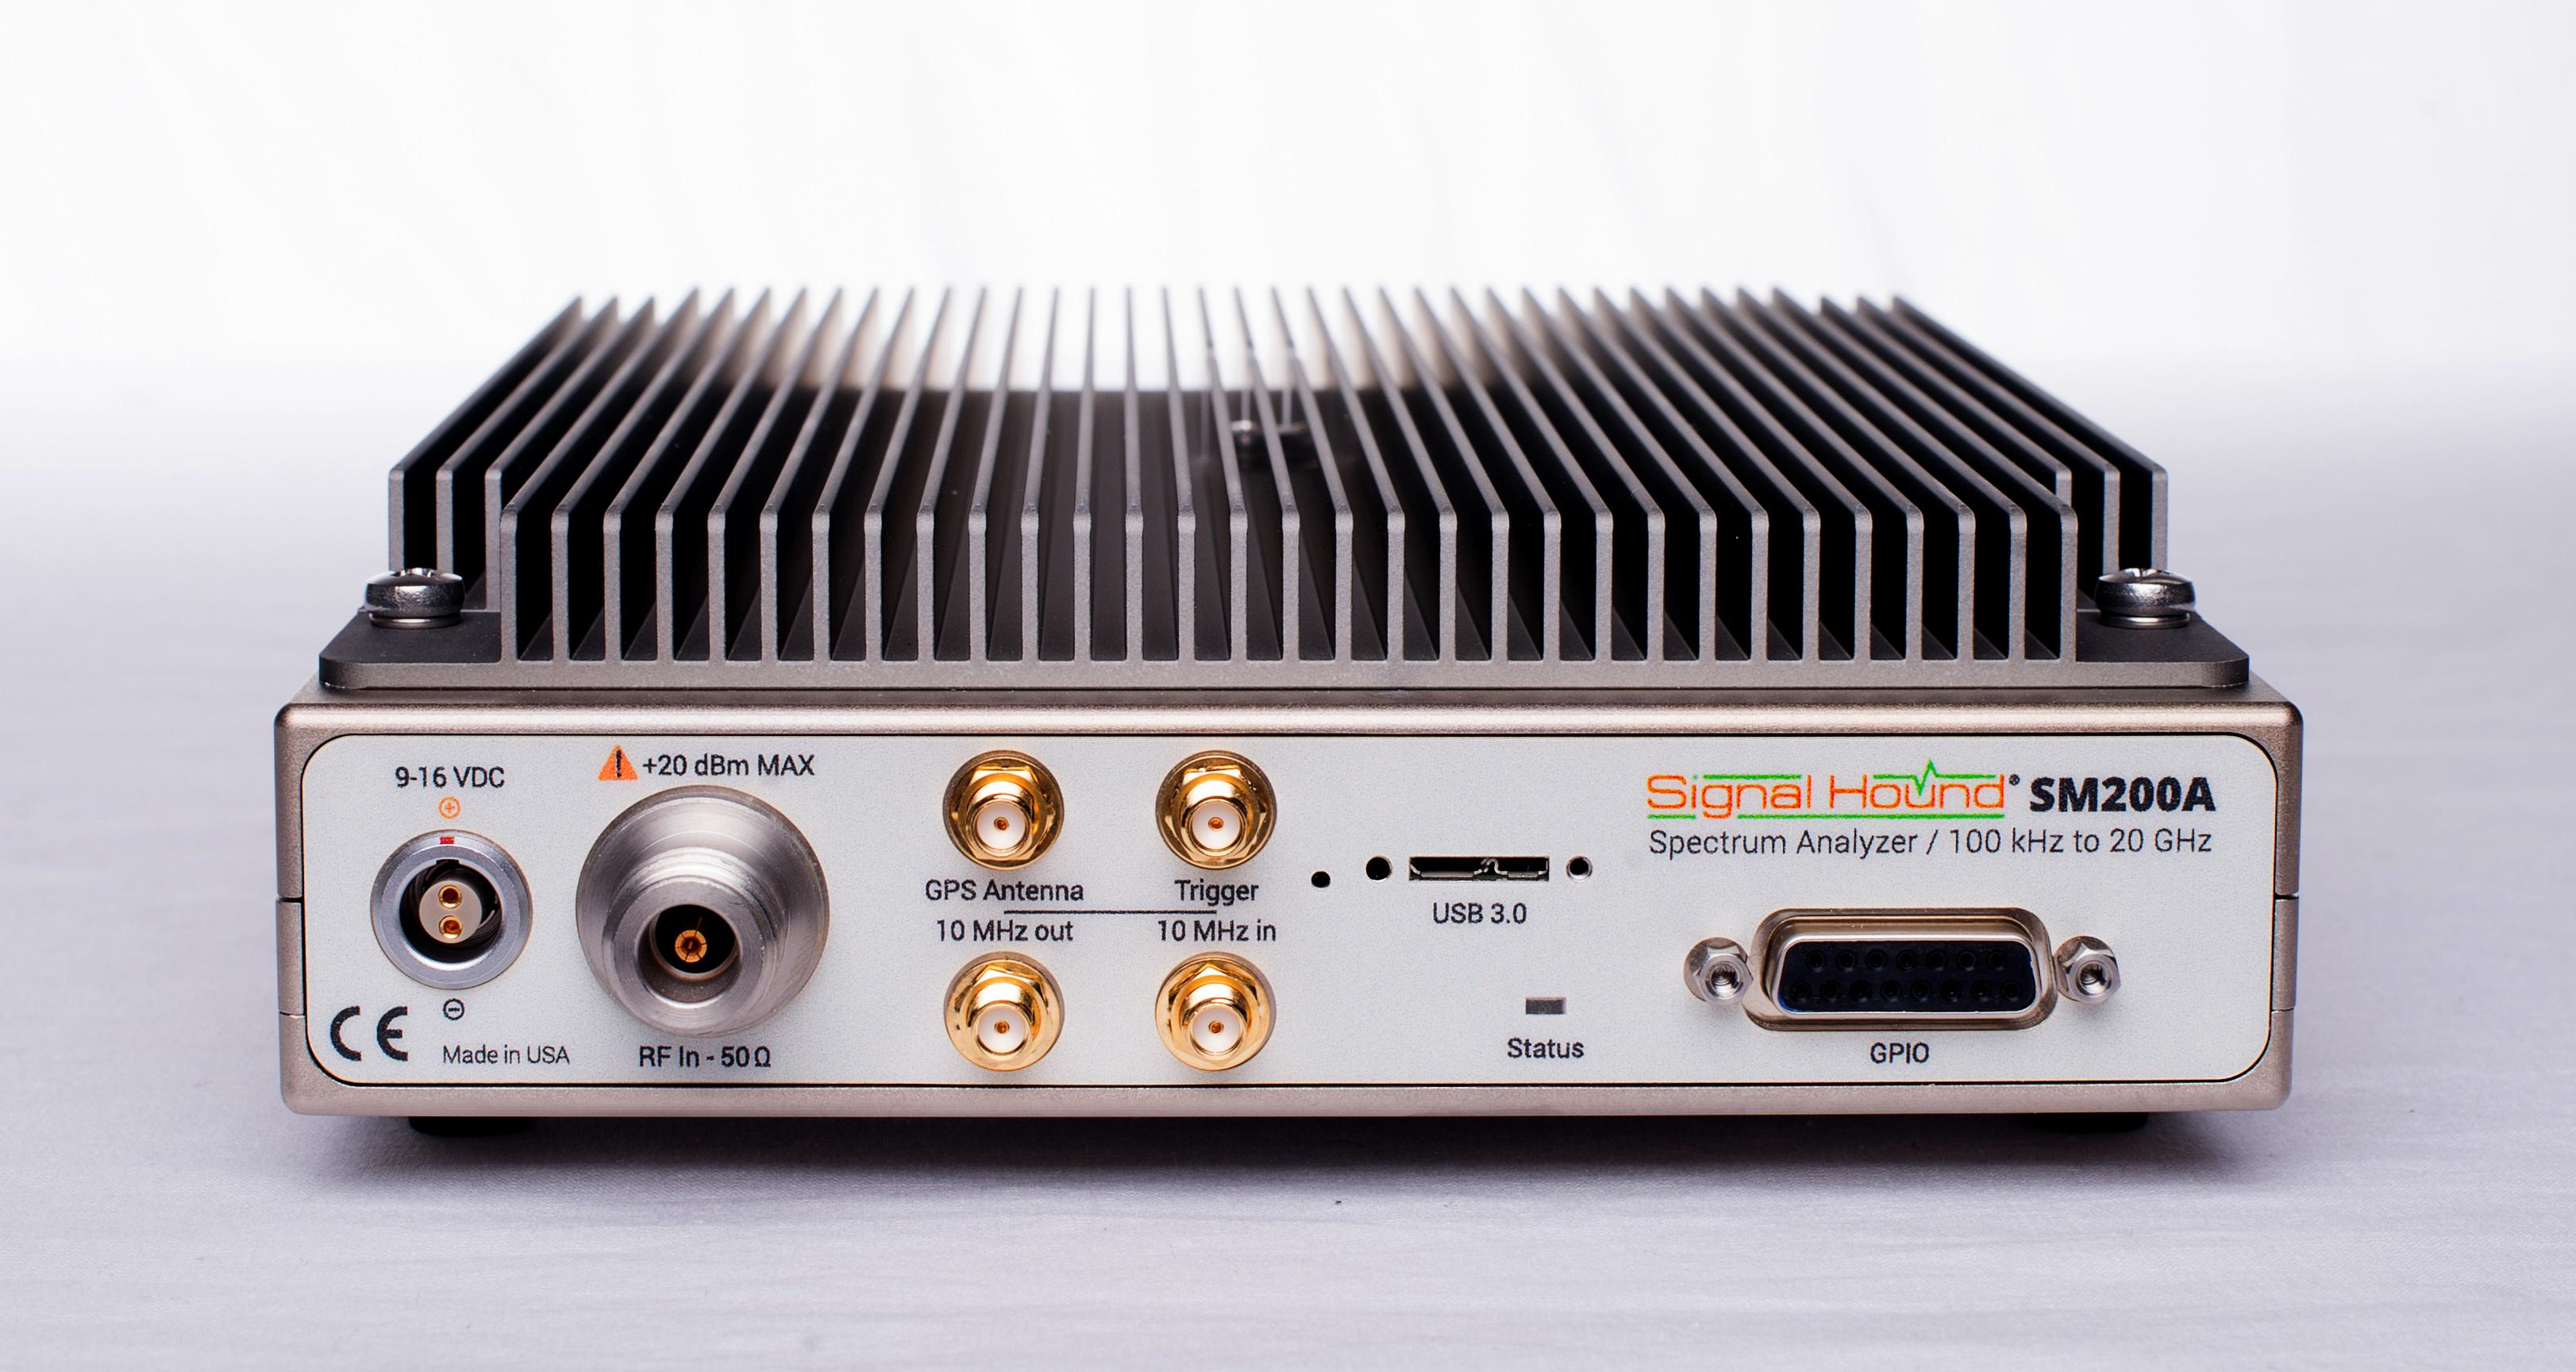 20-GHz High-Performance Spectrum Analyzer SM200A